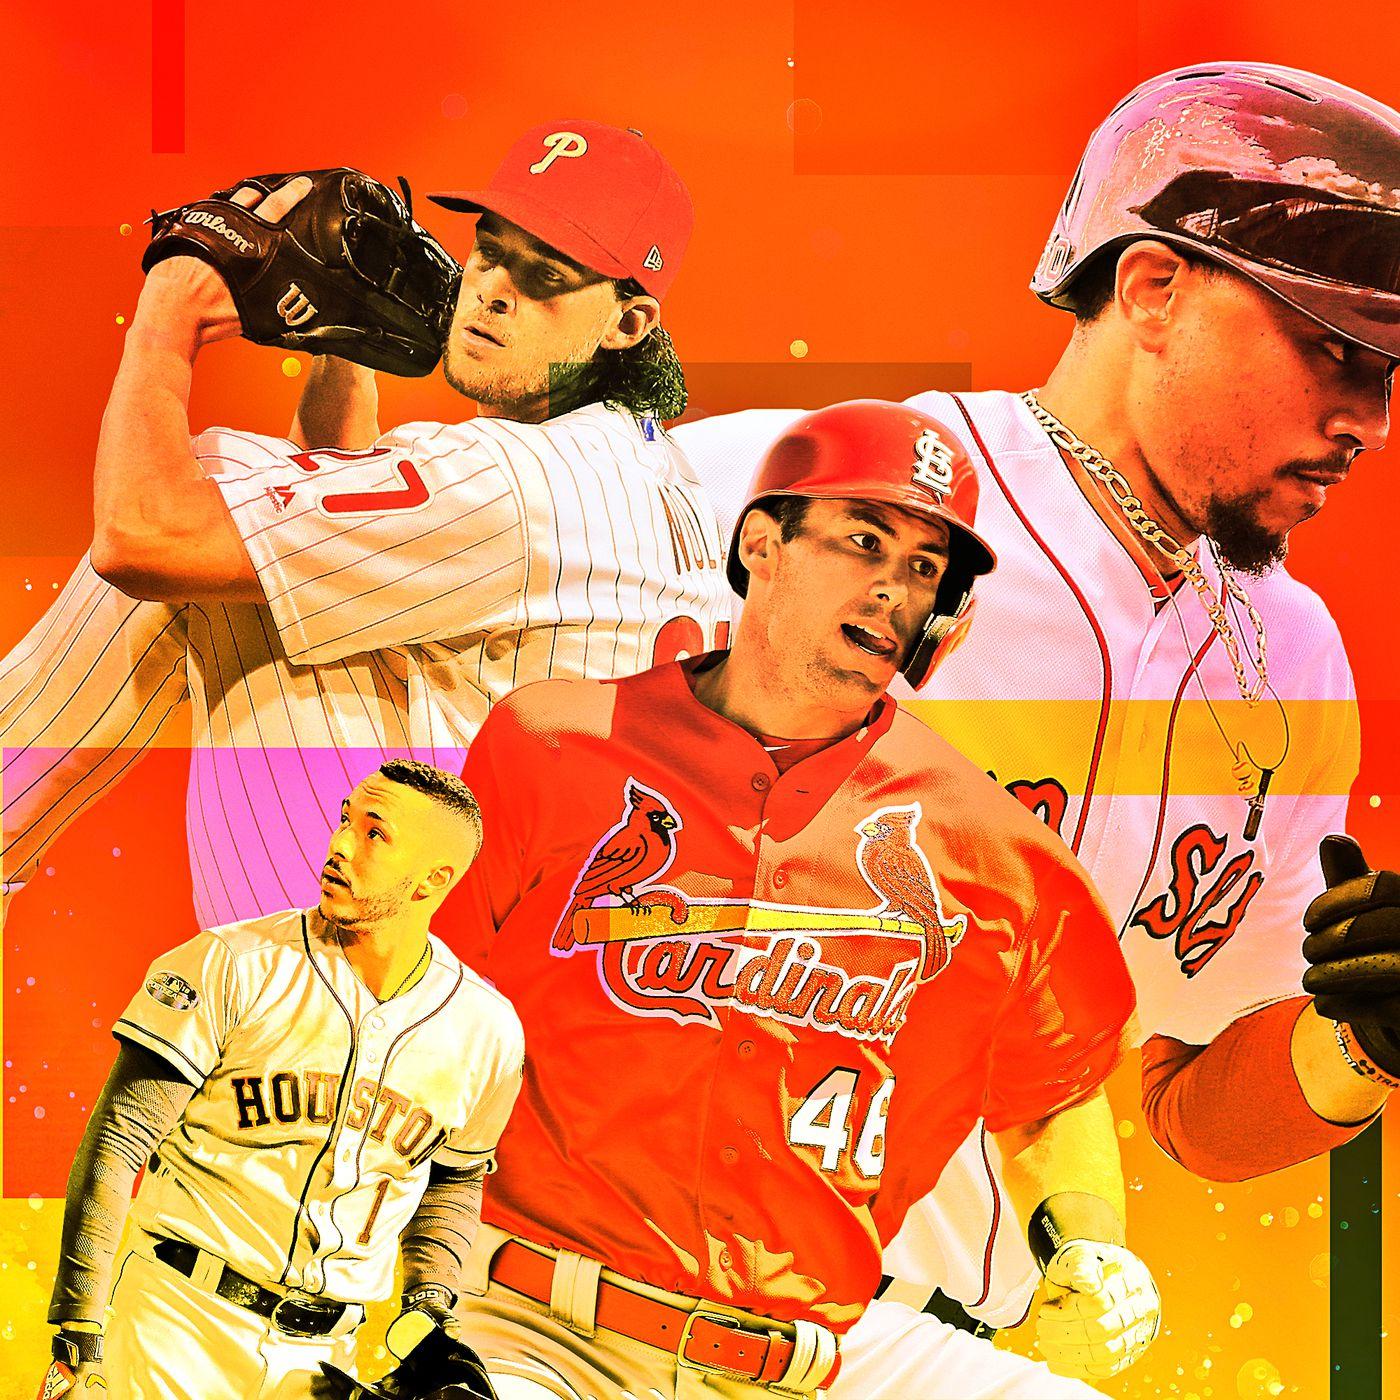 d30d762ead4 The Houston Astros Top the 2019 MLB Preseason Power Rankings - The Ringer